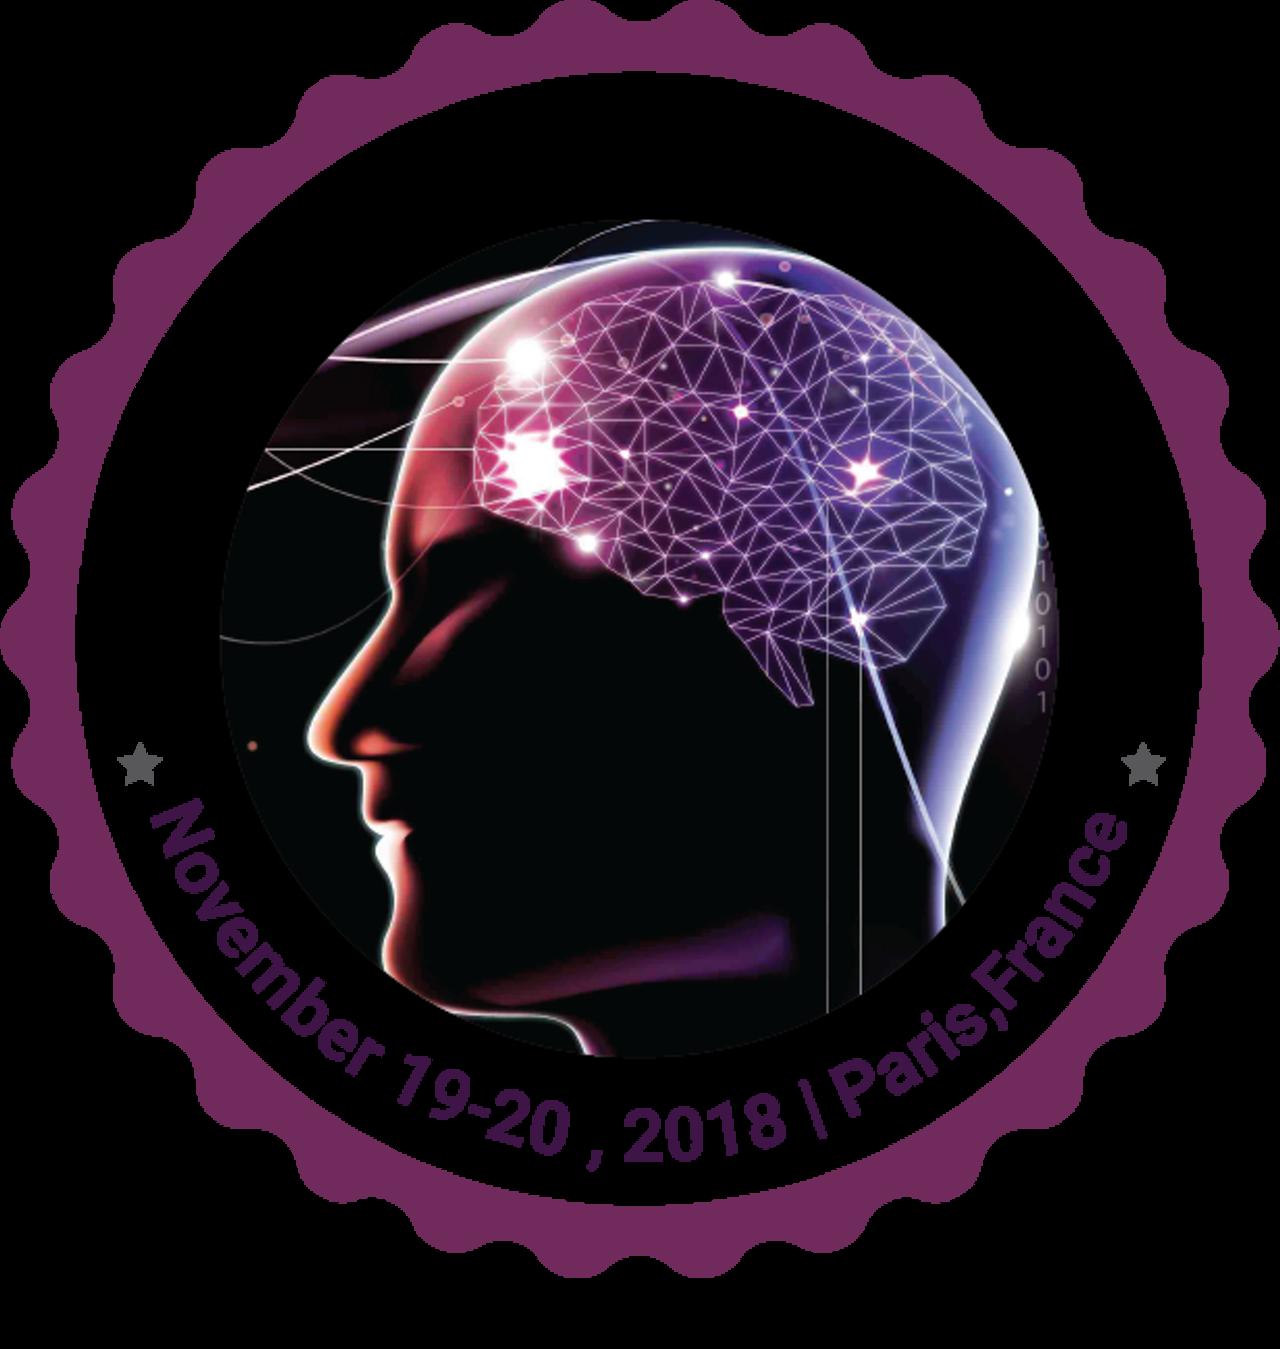 Annual Congress On Psychiatric Mental Health Nursing Holiday Inn